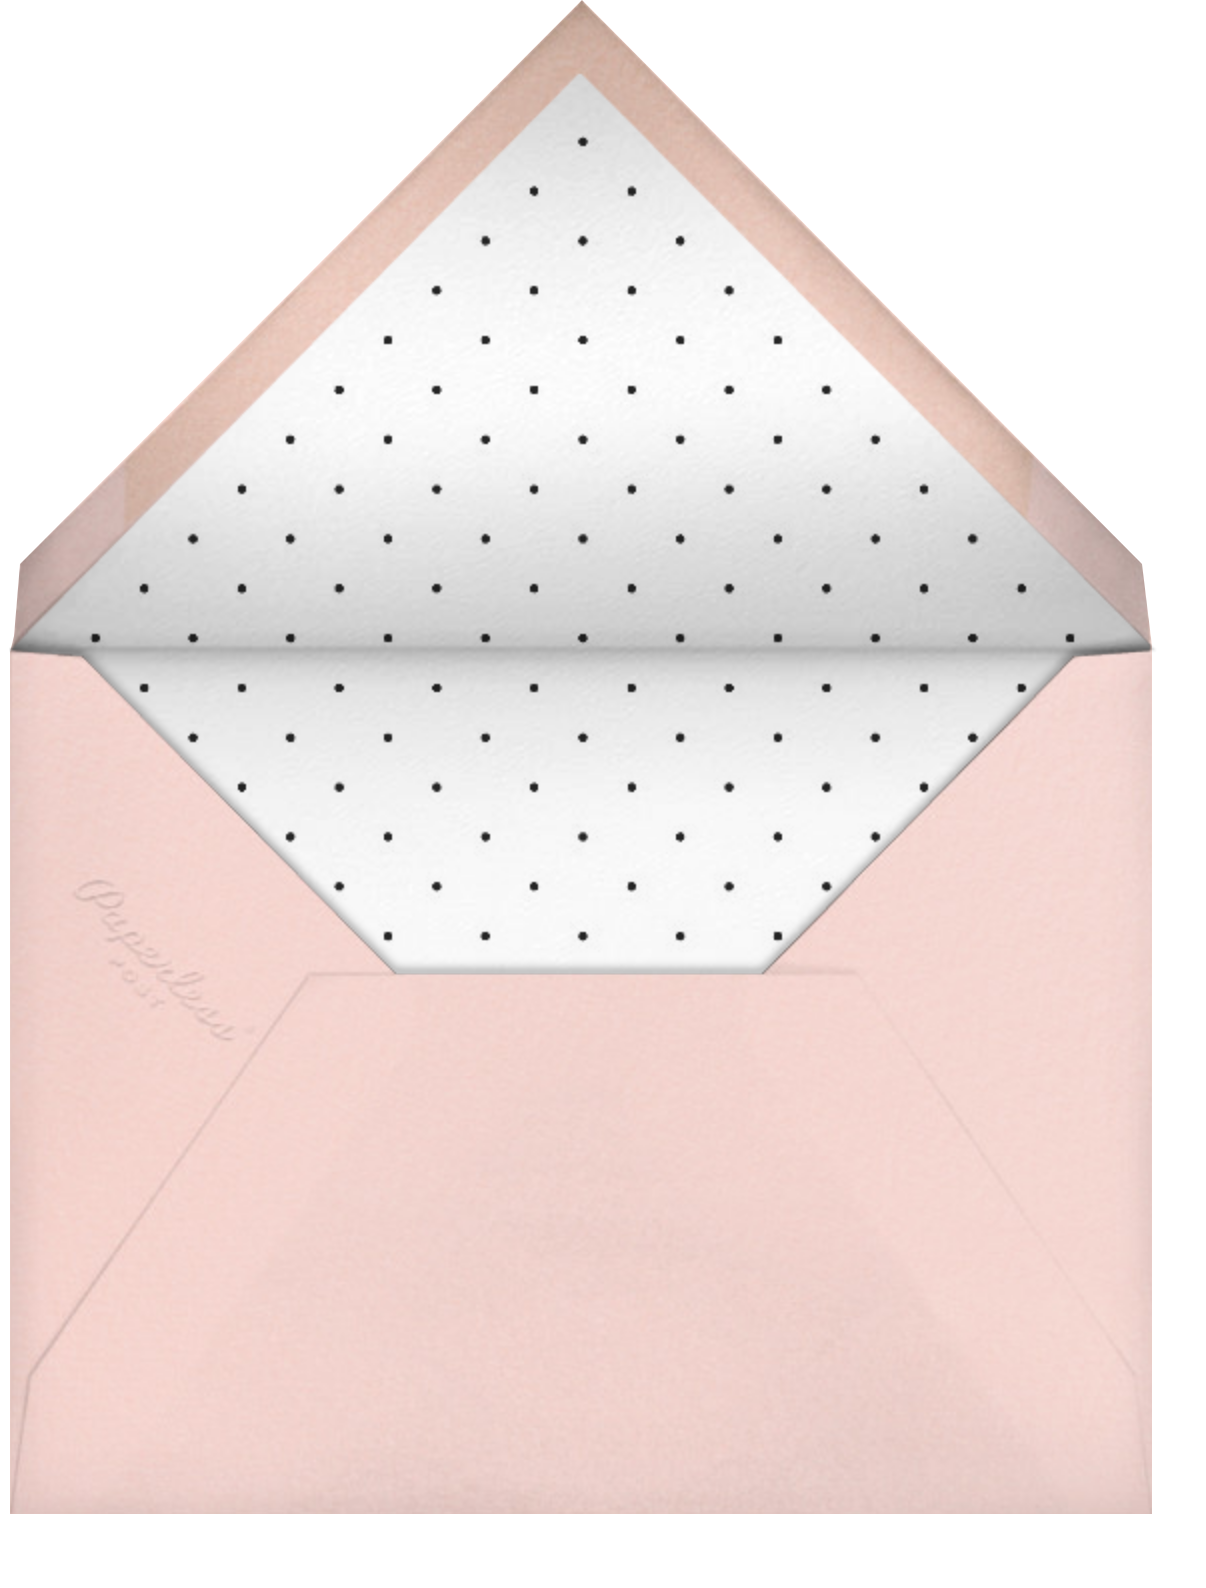 Painted Strawberry - kate spade new york - Envelope